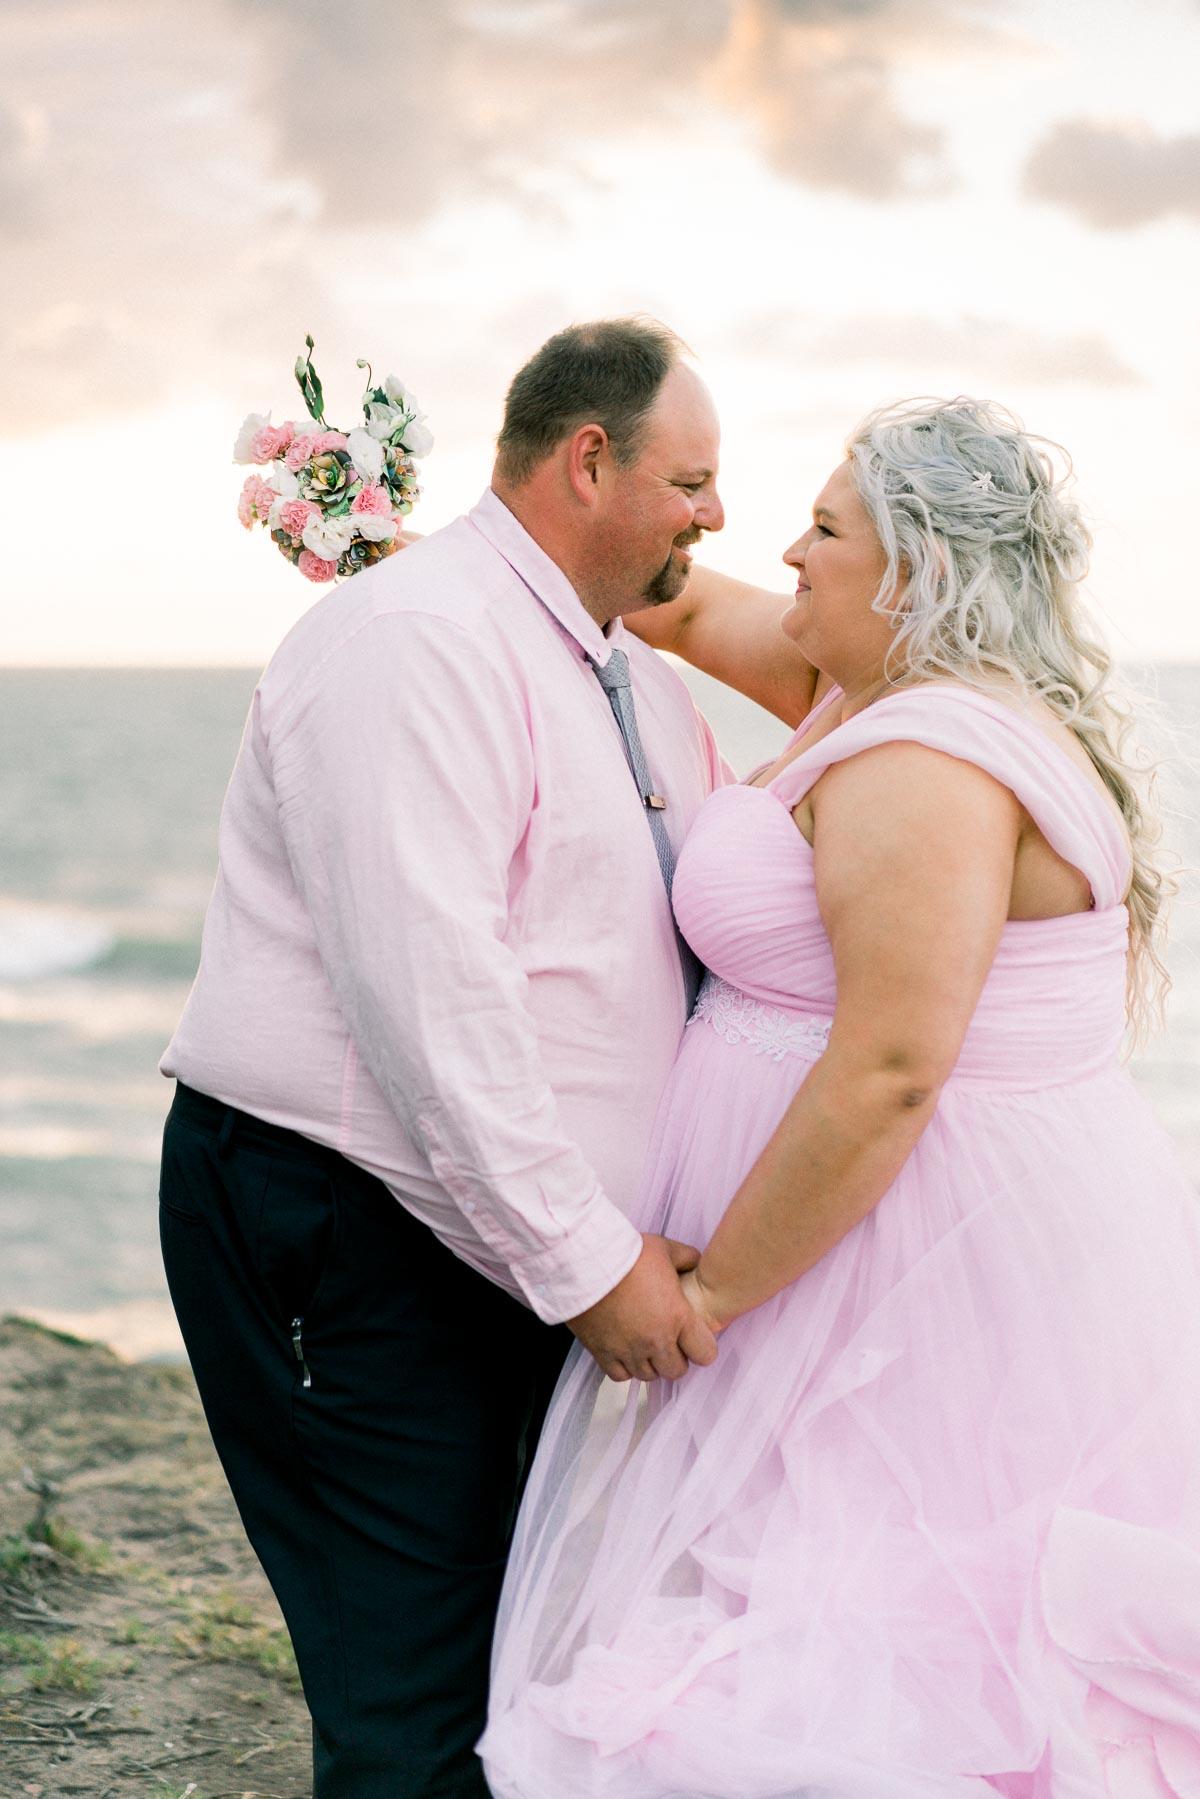 mt-eliza-mornington-peninsula-backyard-wedding-heart+soul-weddings-allison-matt-04095.jpg